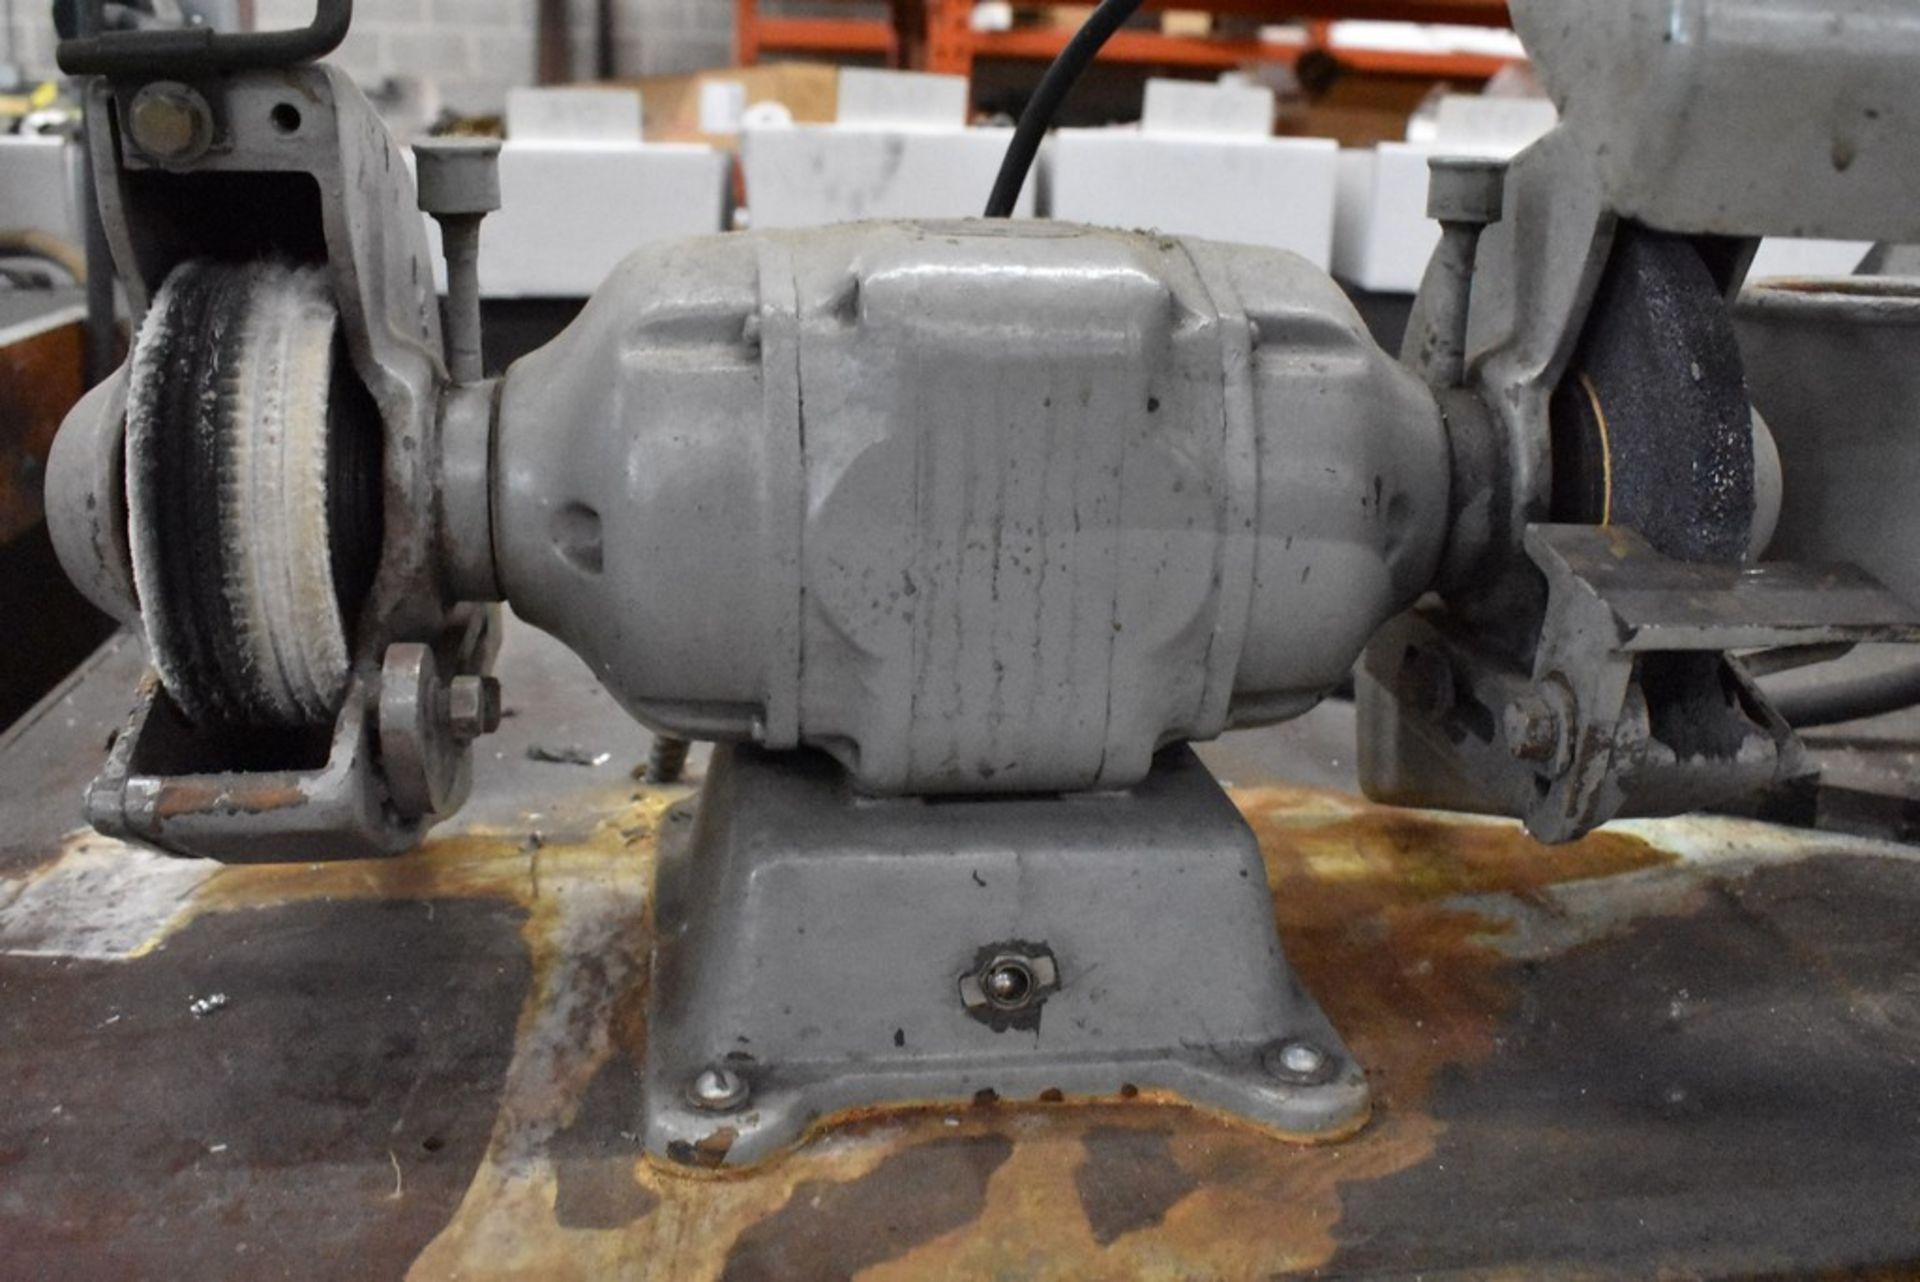 "BADLOR 1/2 HP 6"" DOUBLE END GRINDER - Image 3 of 3"